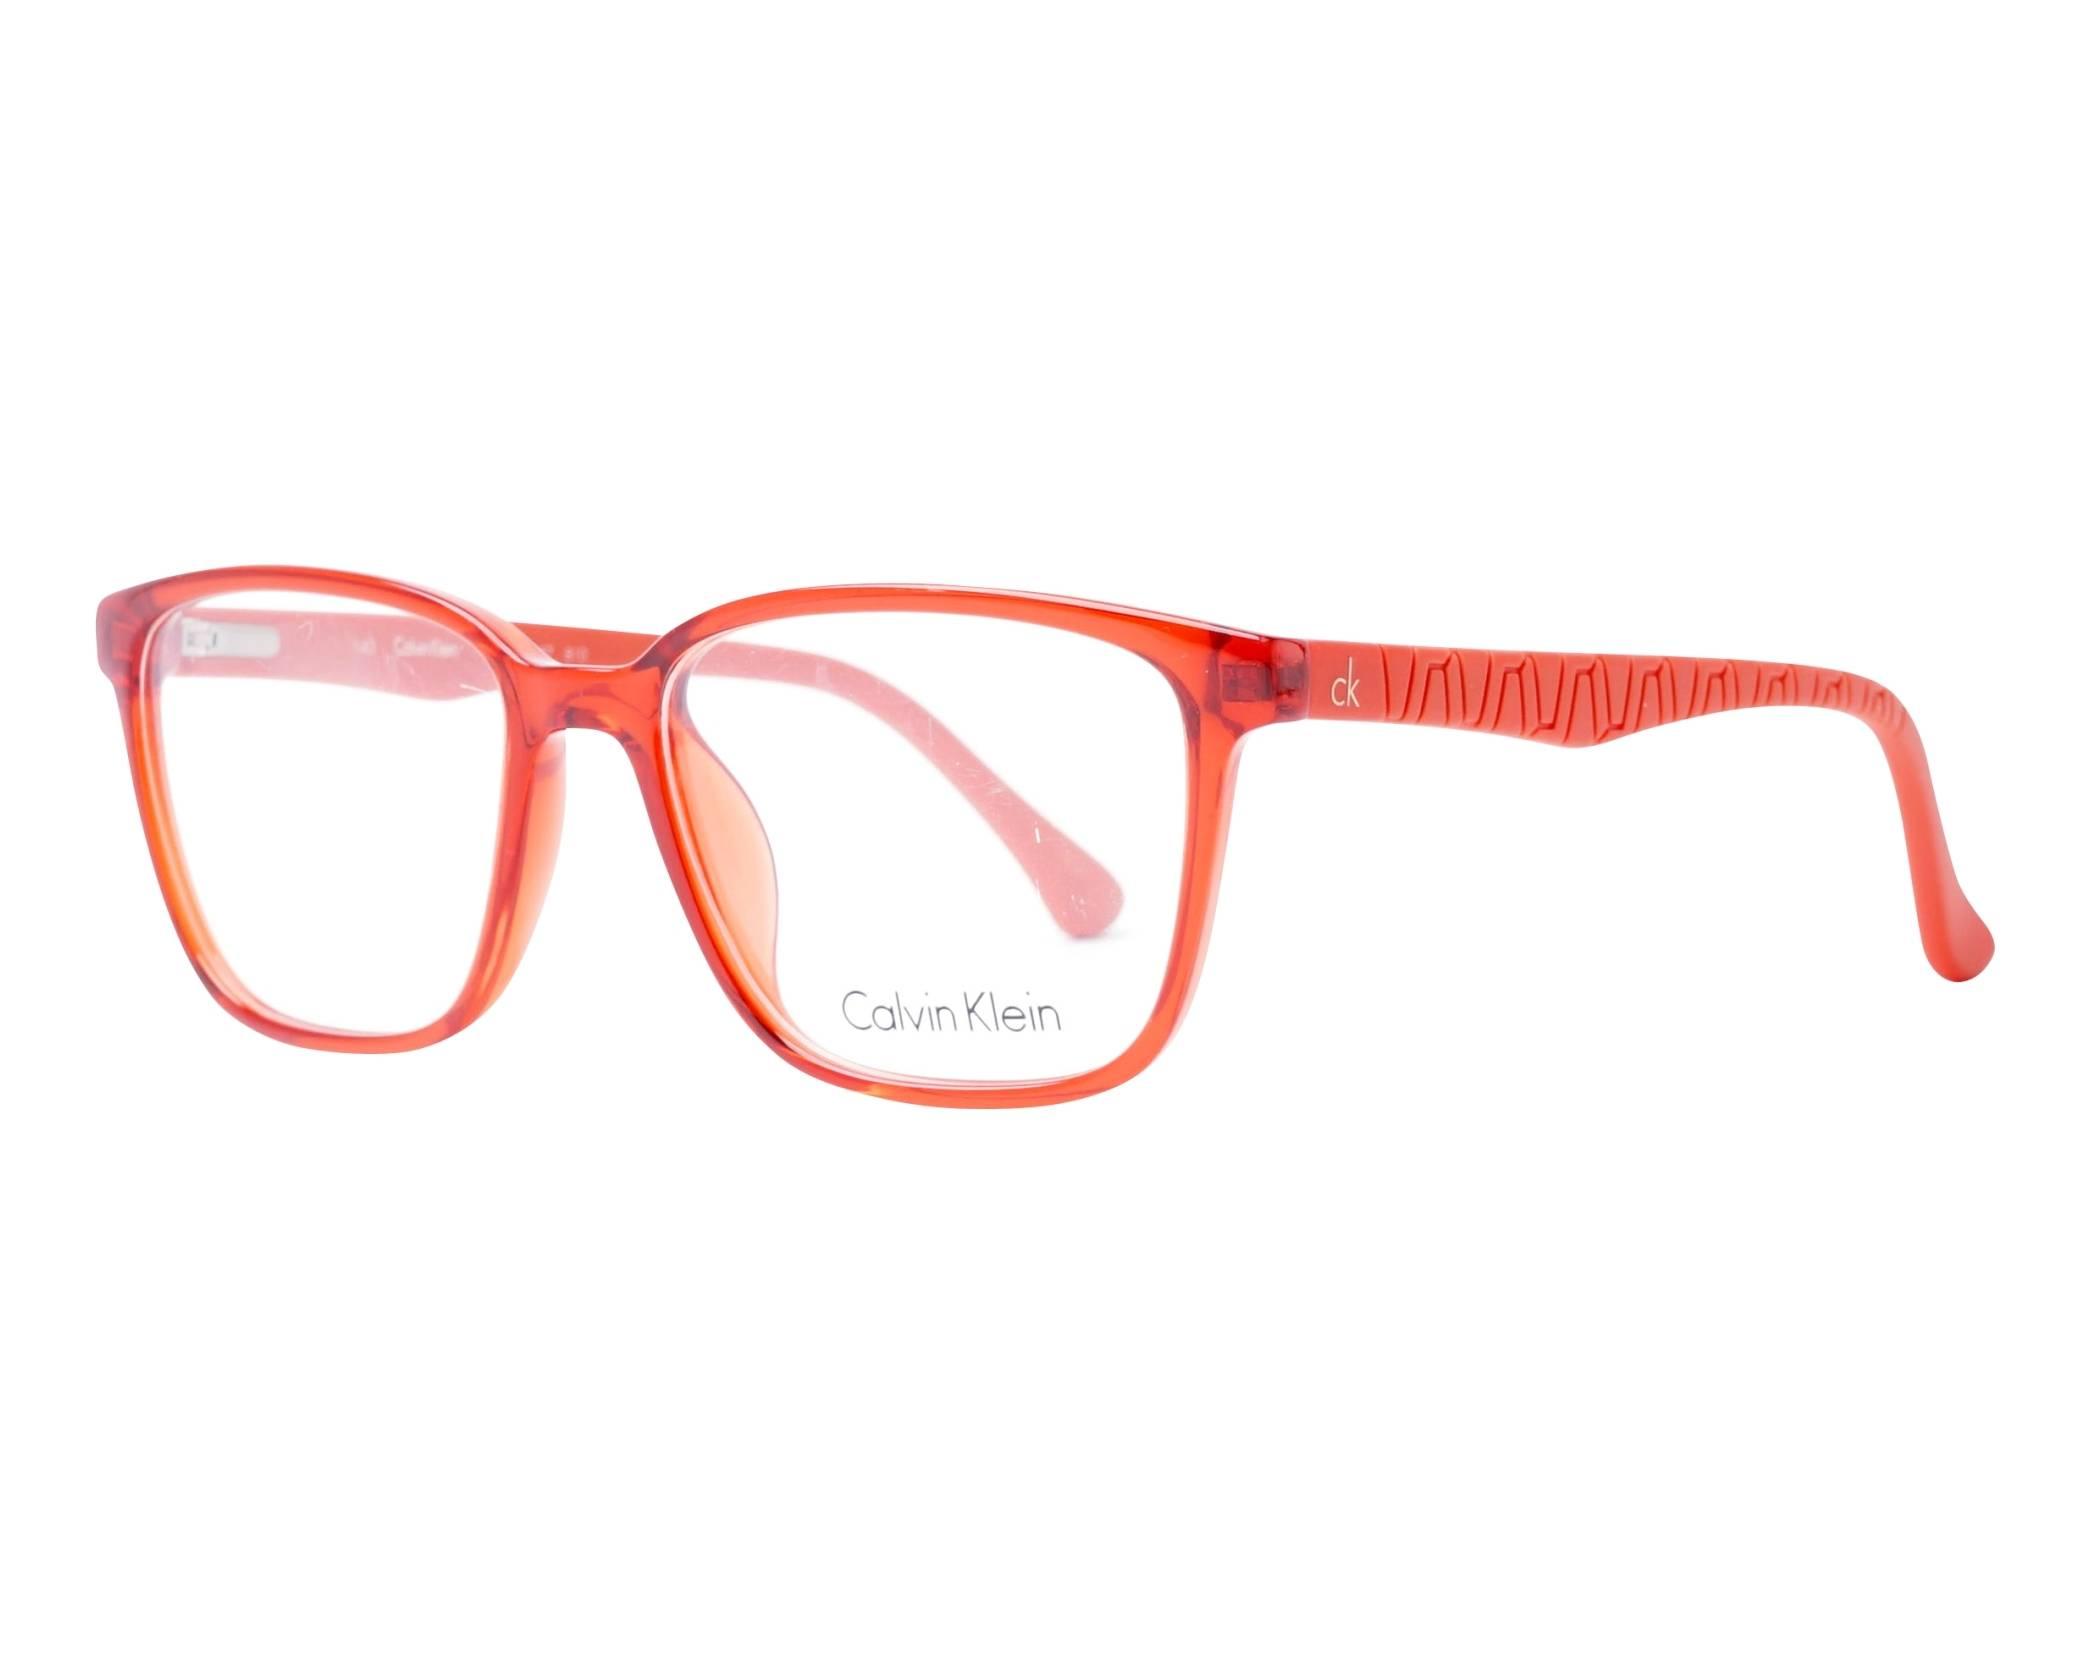 43a67d7076 Gafas Graduadas Calvin Klein CK-5857 810 53-17 Naranja Naranja vista de  perfil